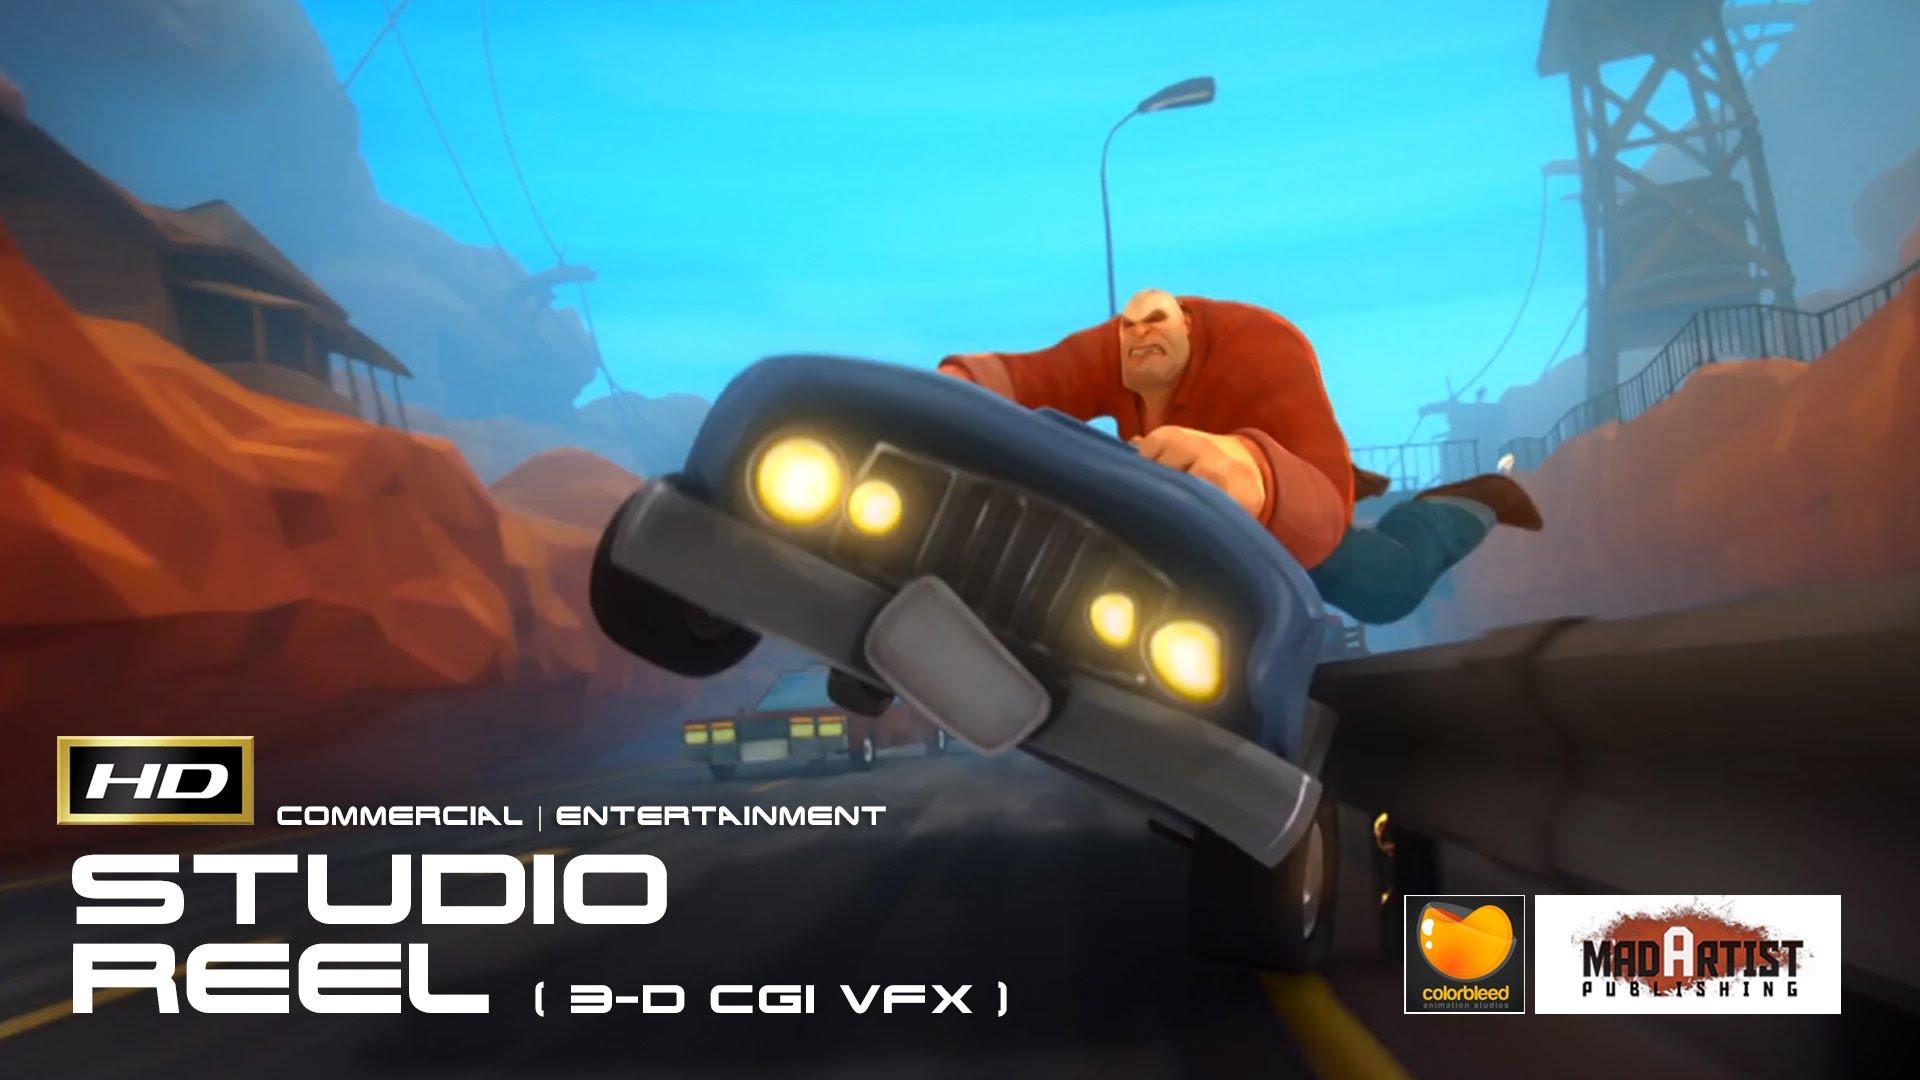 COLORBLEED 2015 Animation Studio SHOWREEL (HD) 3D CGI